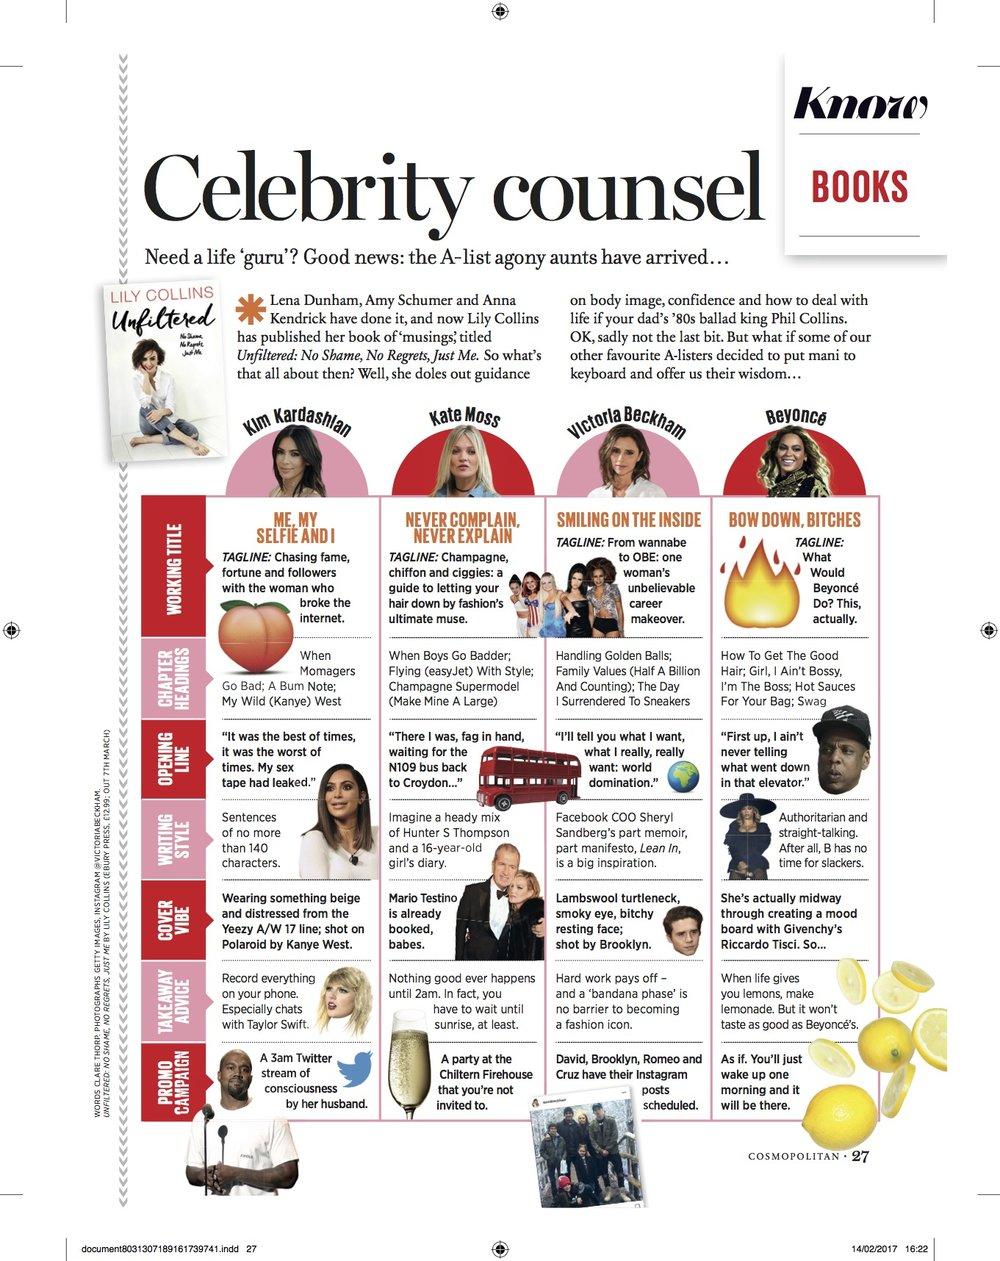 Cosmopolitan Celeb essays.jpg